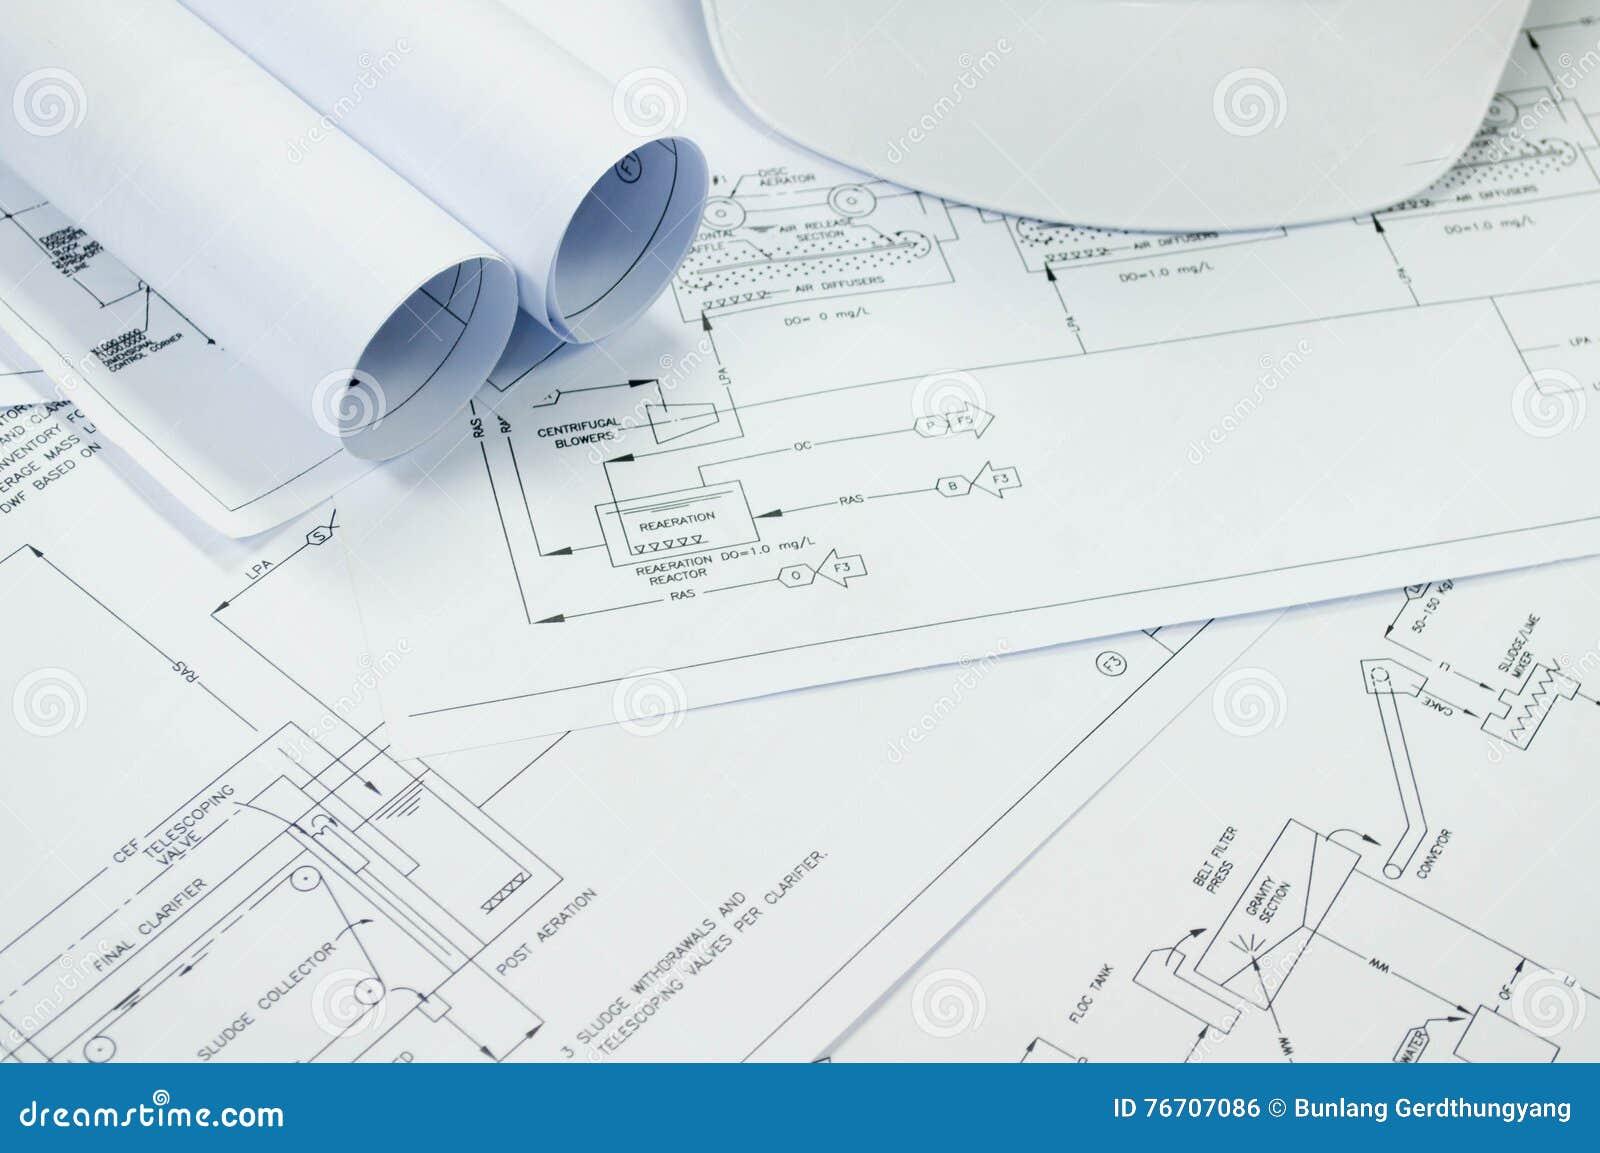 Engineering drawing for environmental engineering process to download engineering drawing for environmental engineering process to treatment stock photo image of blueprint malvernweather Choice Image